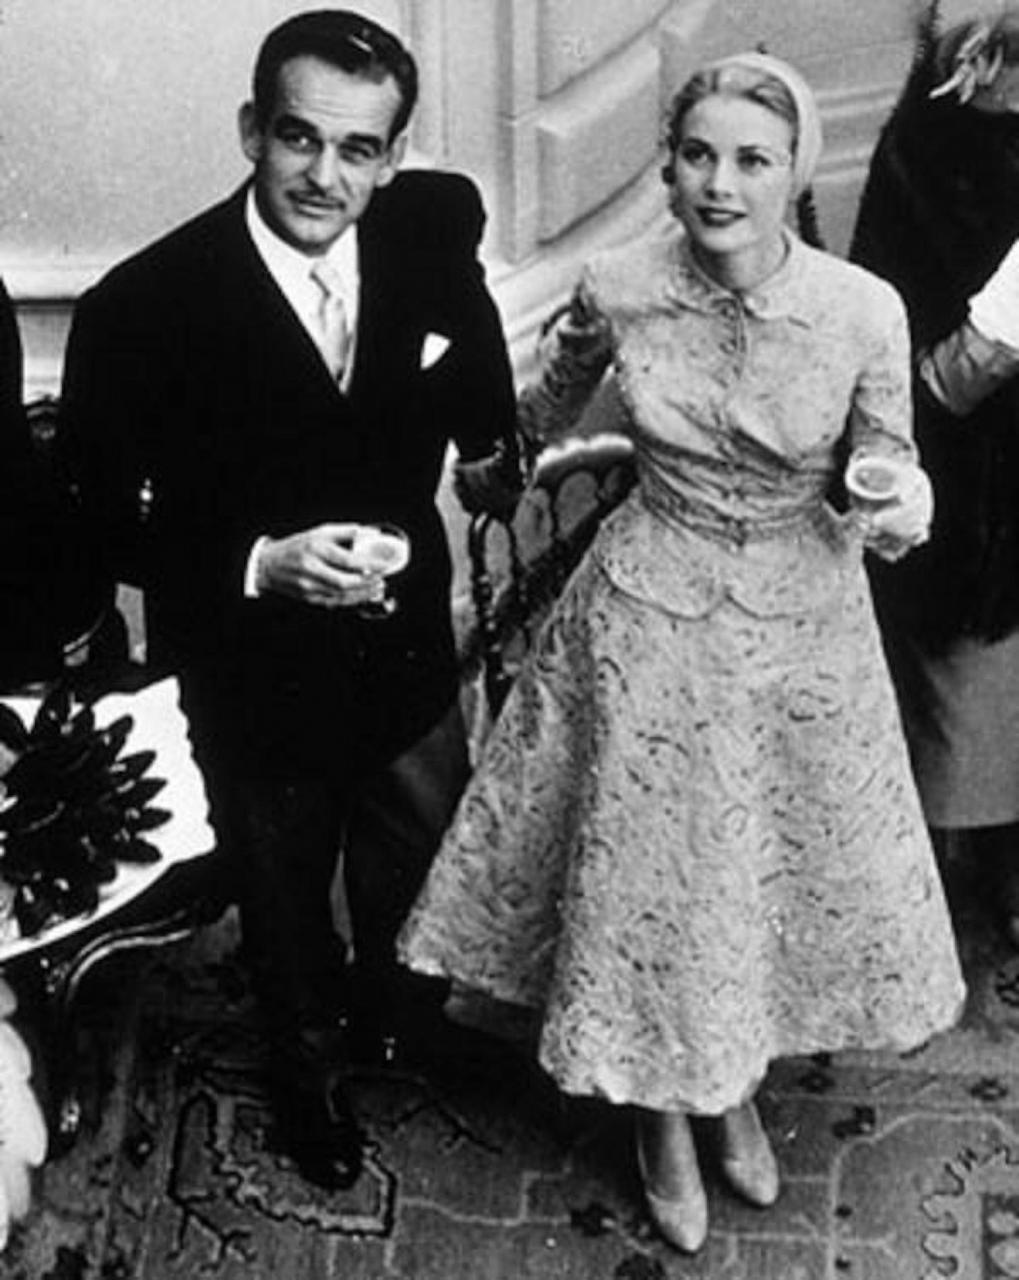 Prince Rainier III of Monaco & Grace Kelly on honeymoon in Mallorca.